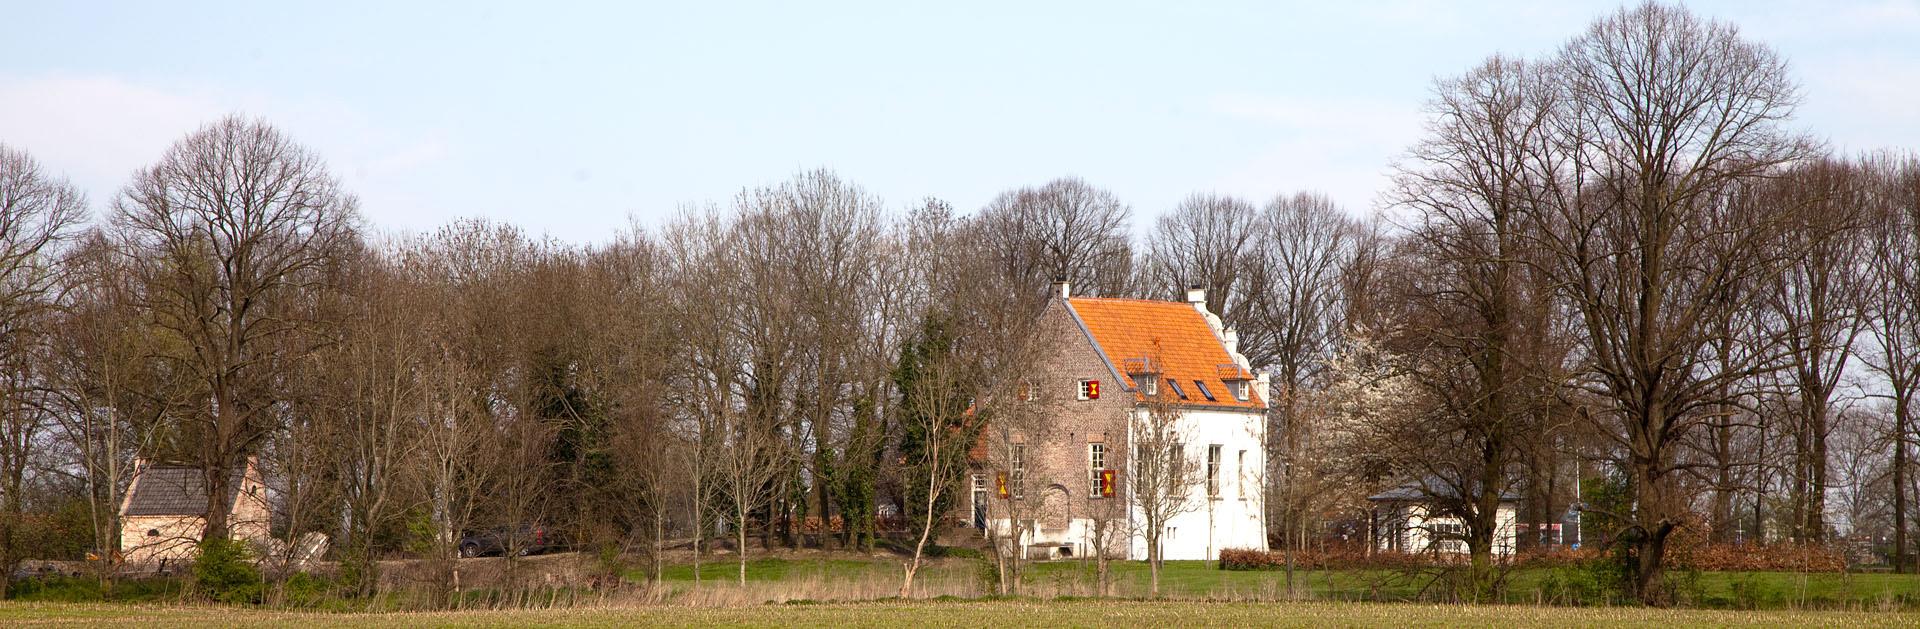 Huis te Lathum - Lathum Regio Achterhoek - Liemers